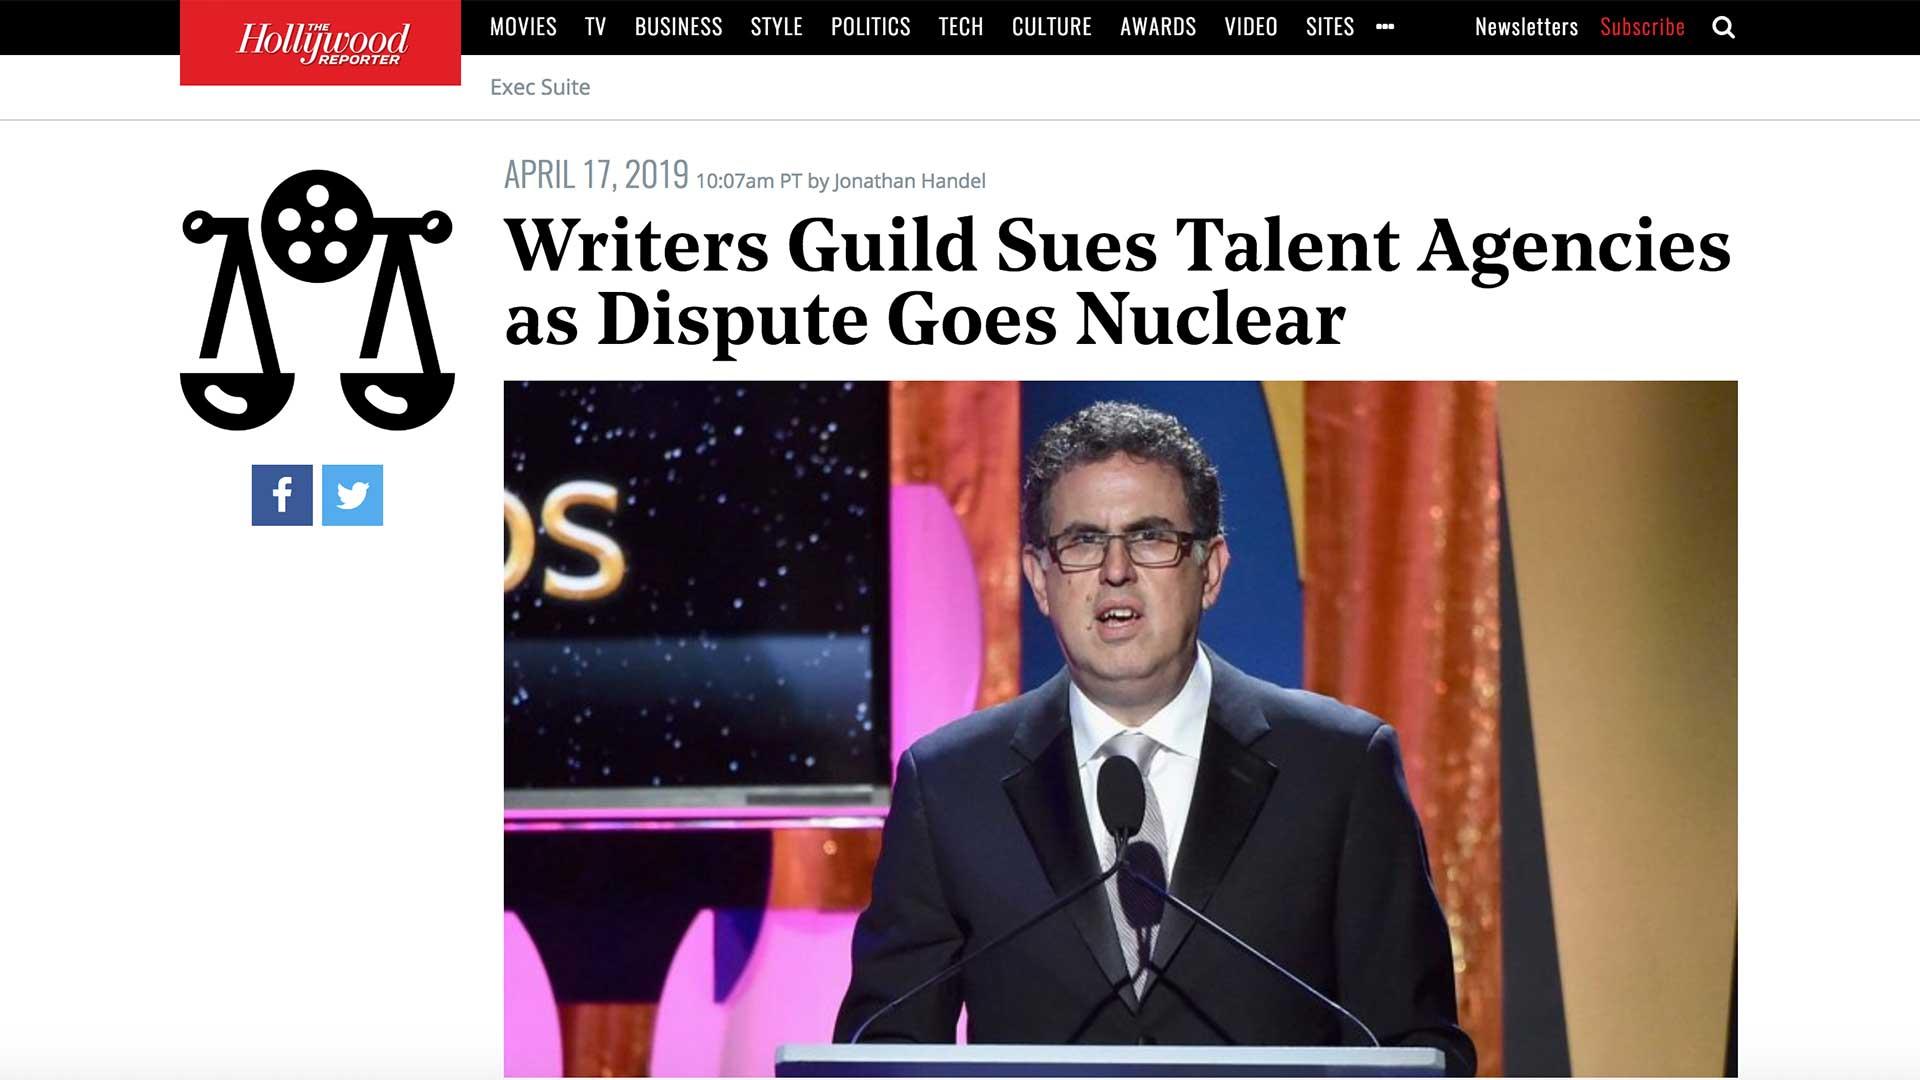 Fairness Rocks News Writers Guild Sues Talent Agencies as Dispute Goes Nuclear